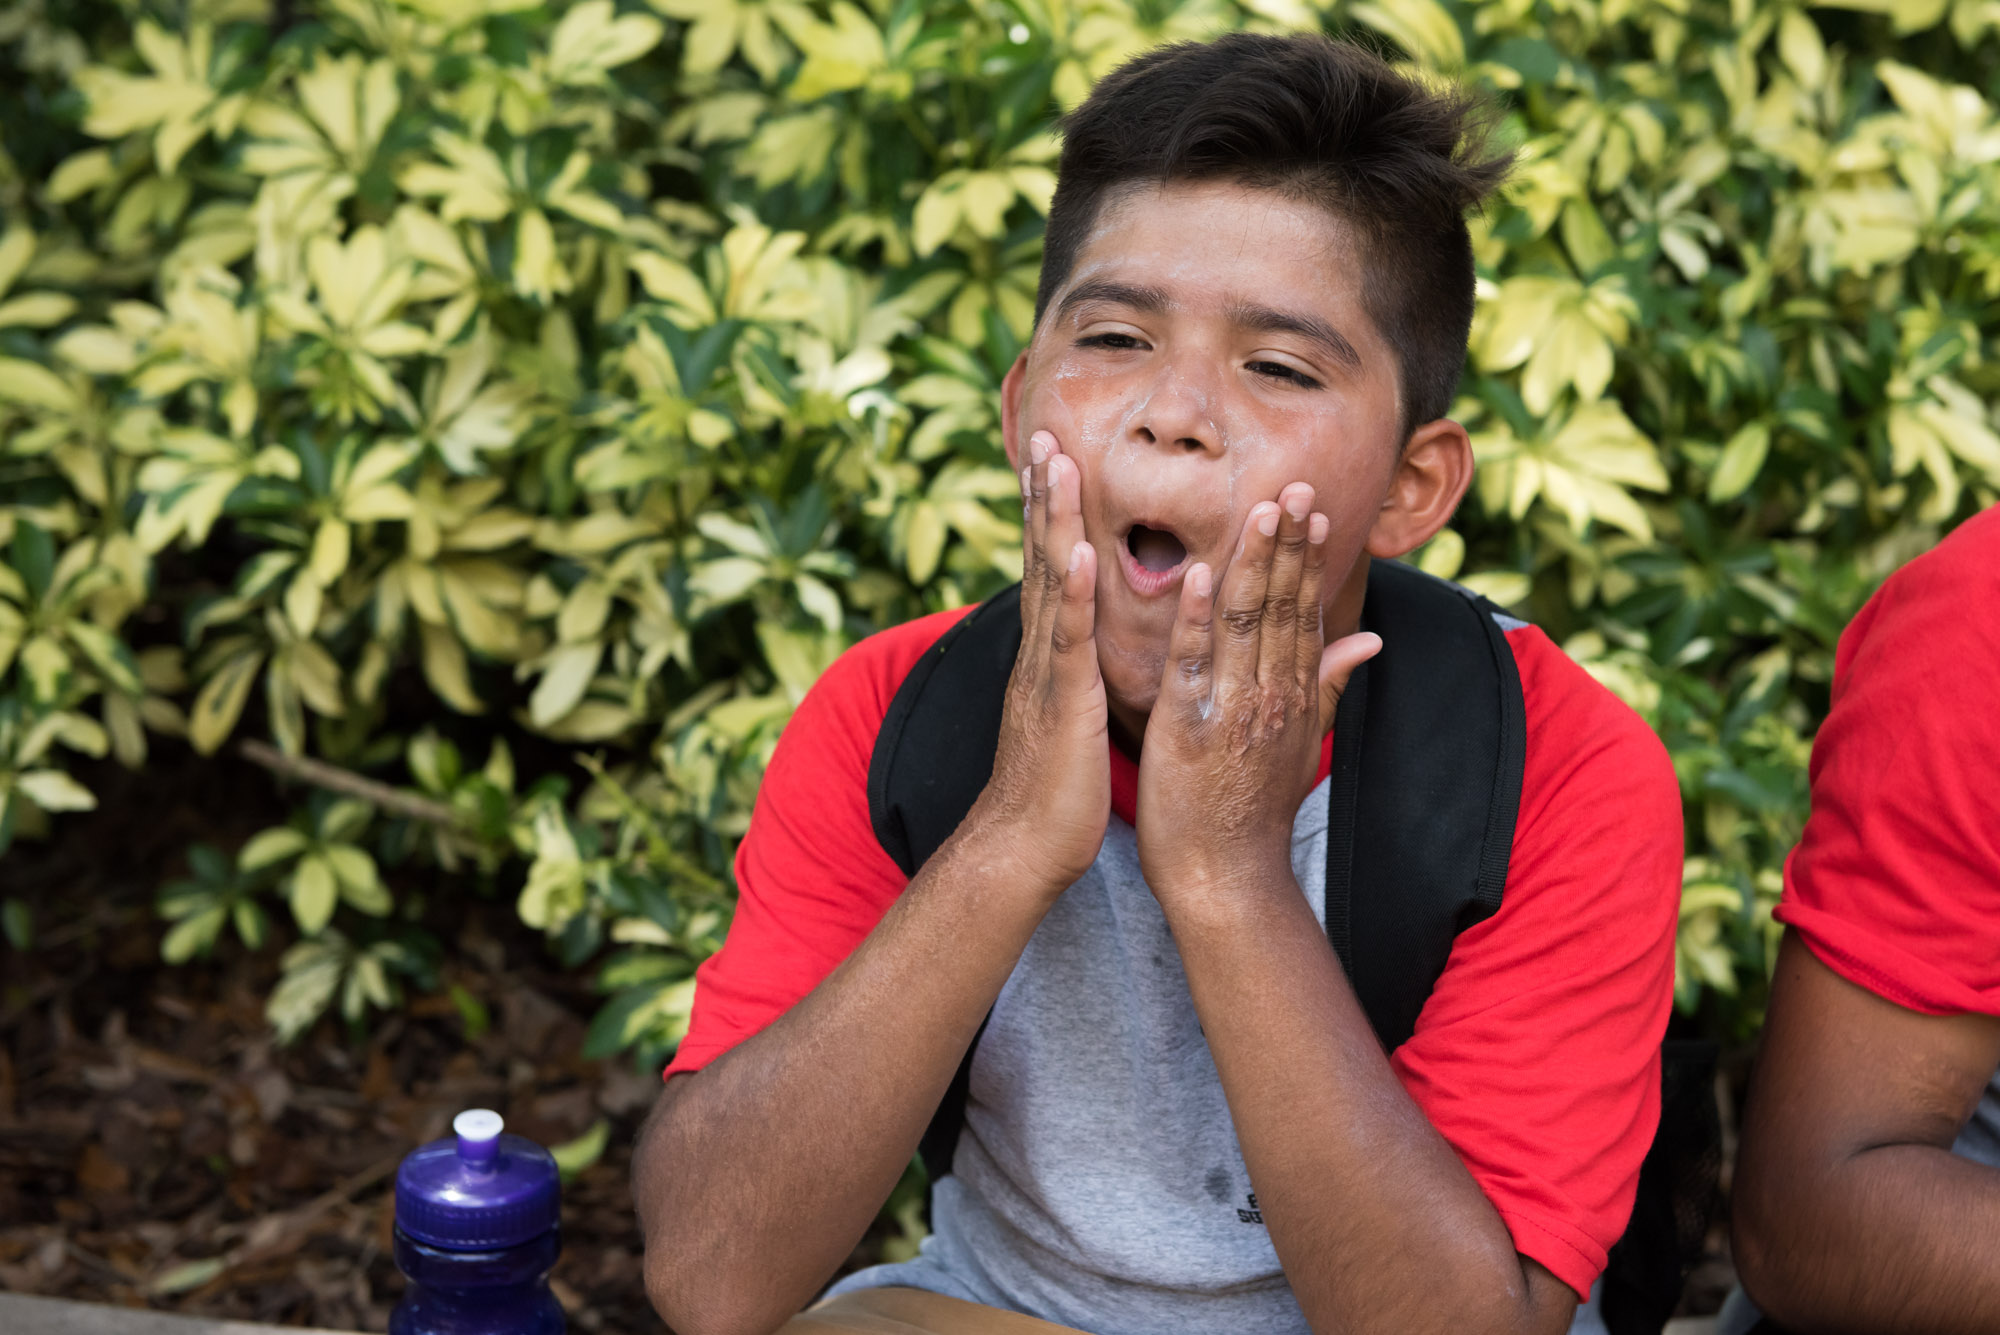 Young boy applying sunscreen at Busch Gardens with Camp Hopetake